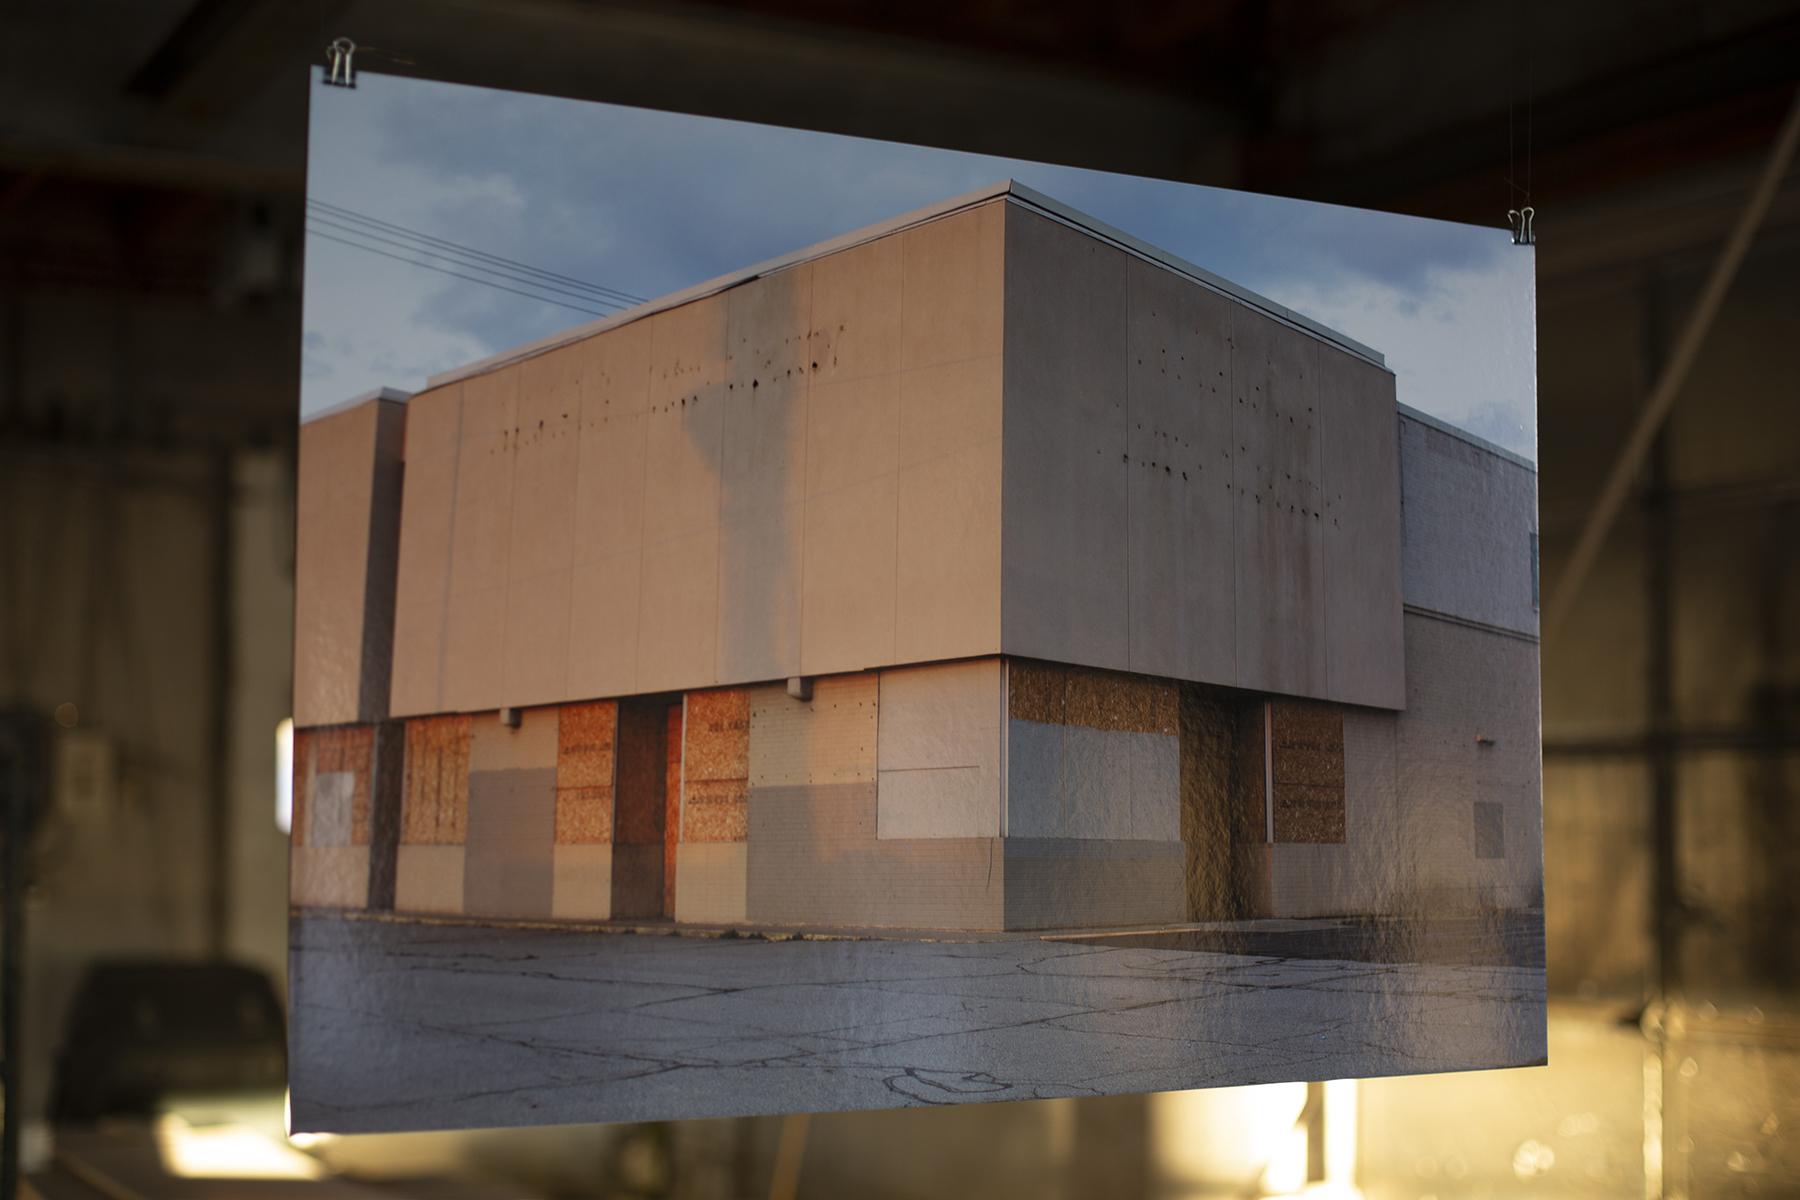 Department Store (installed), Araceli Haslam